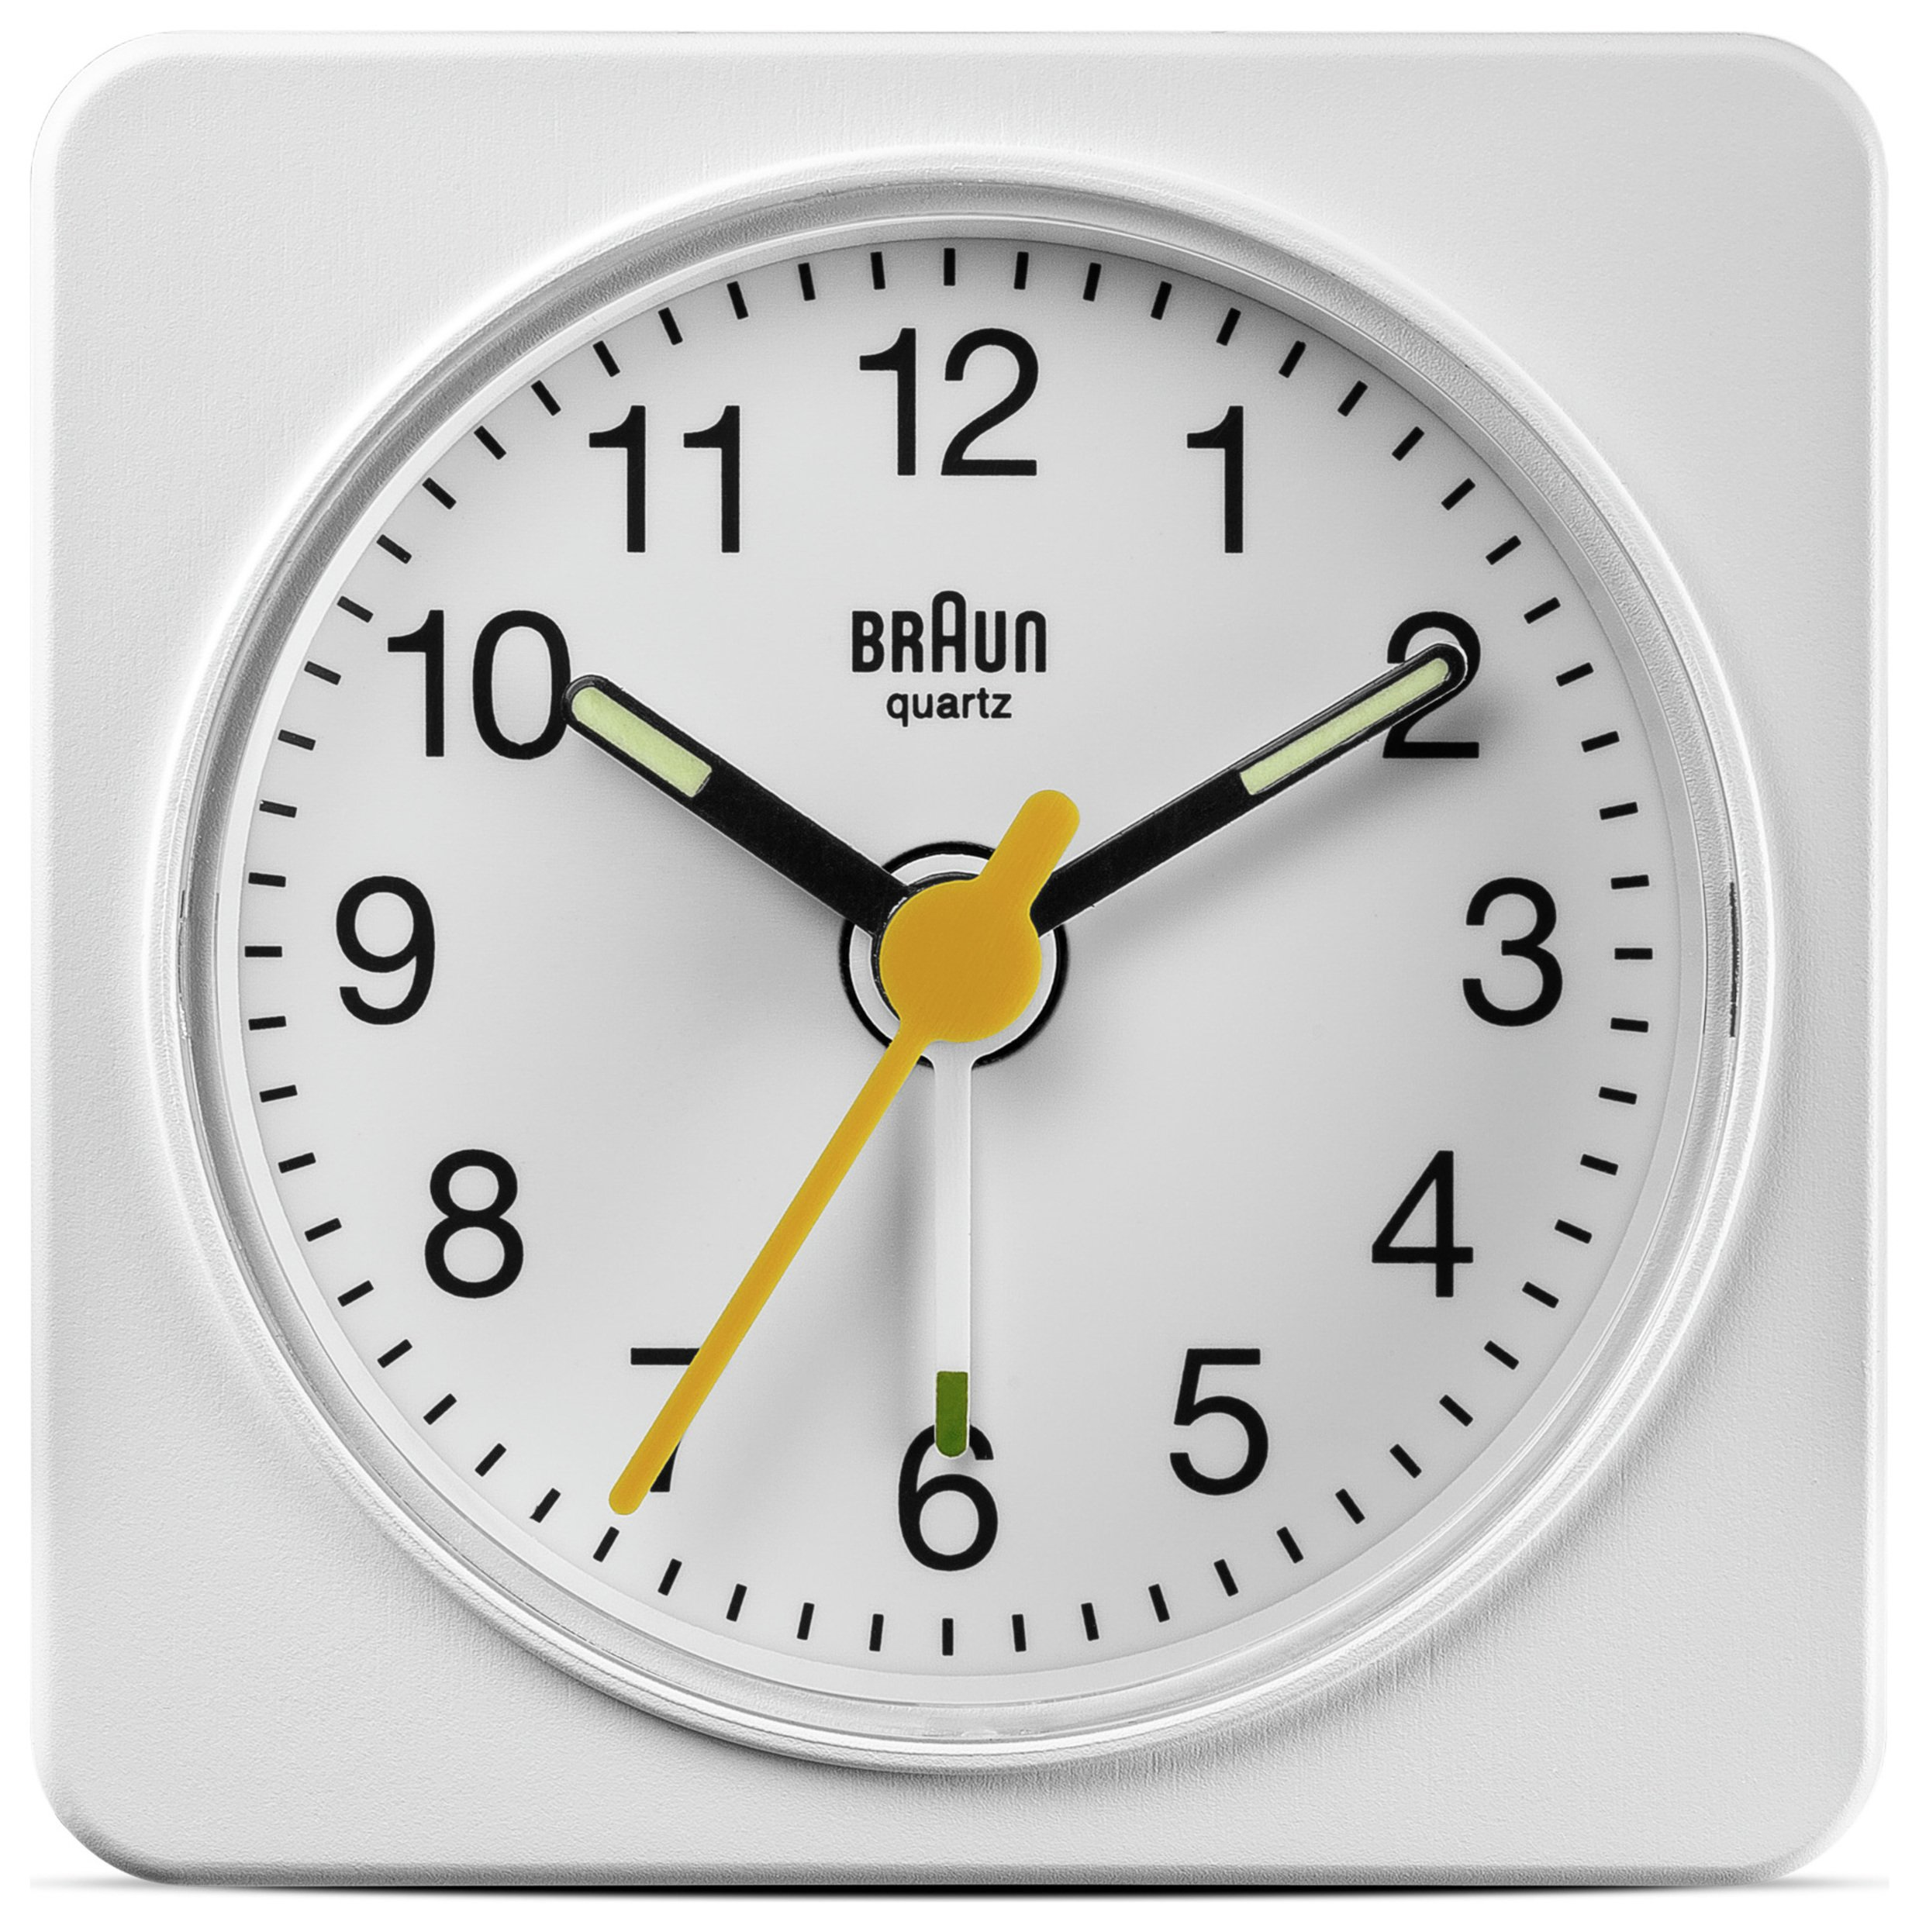 Image of Braun Travel Alarm Clock - White